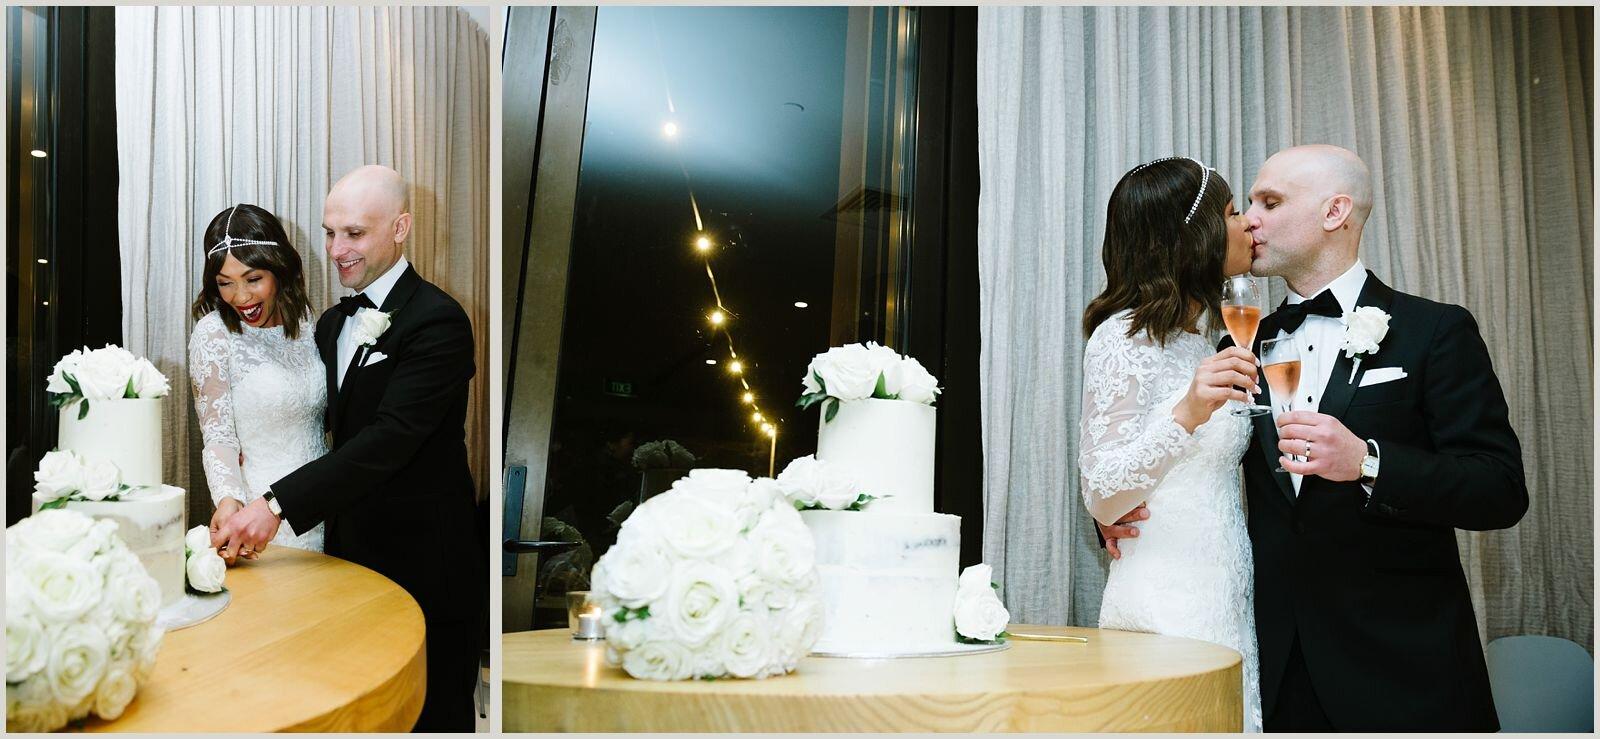 joseph_koprek_wedding_melbourne_the_prince_deck_0077.jpg